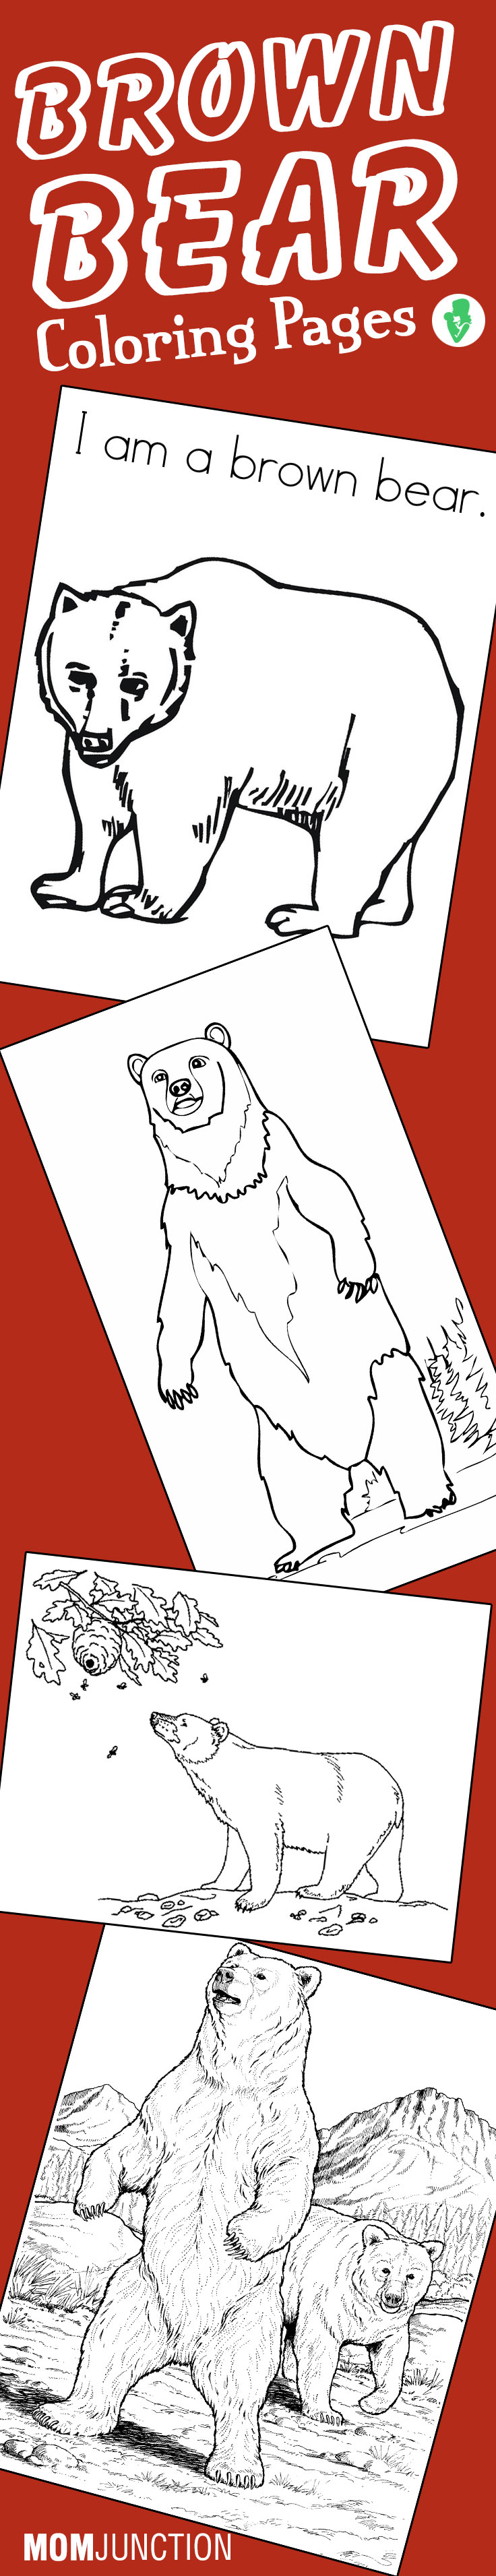 Top 10 Free Printable Brown Bear Coloring Pages Online | Brown bear ...